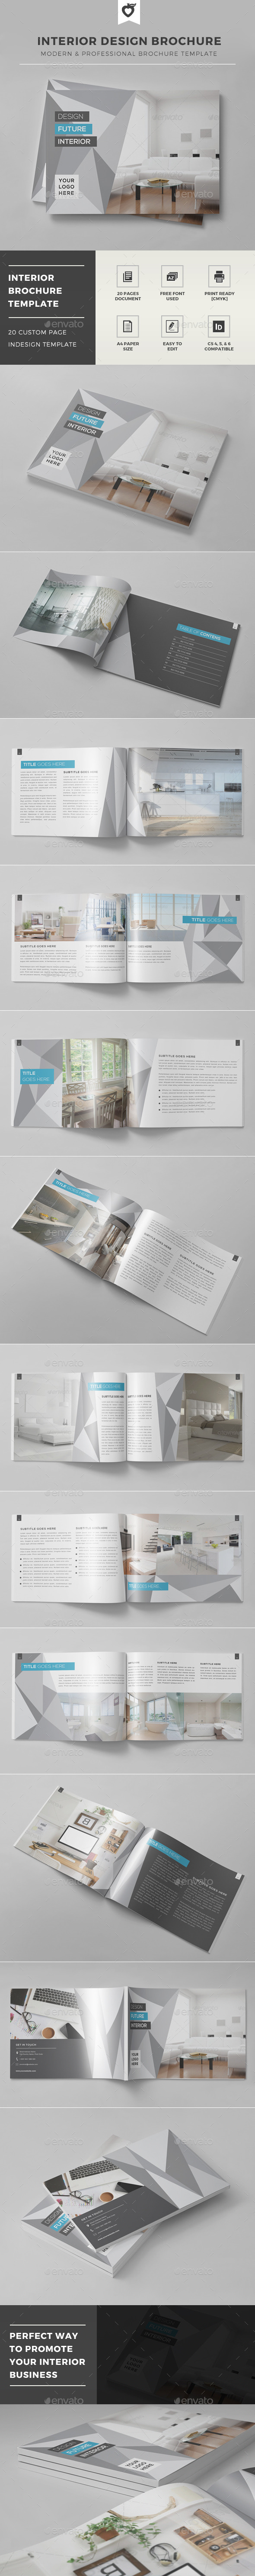 Interior Design Brochure Template - Catalogs Brochures